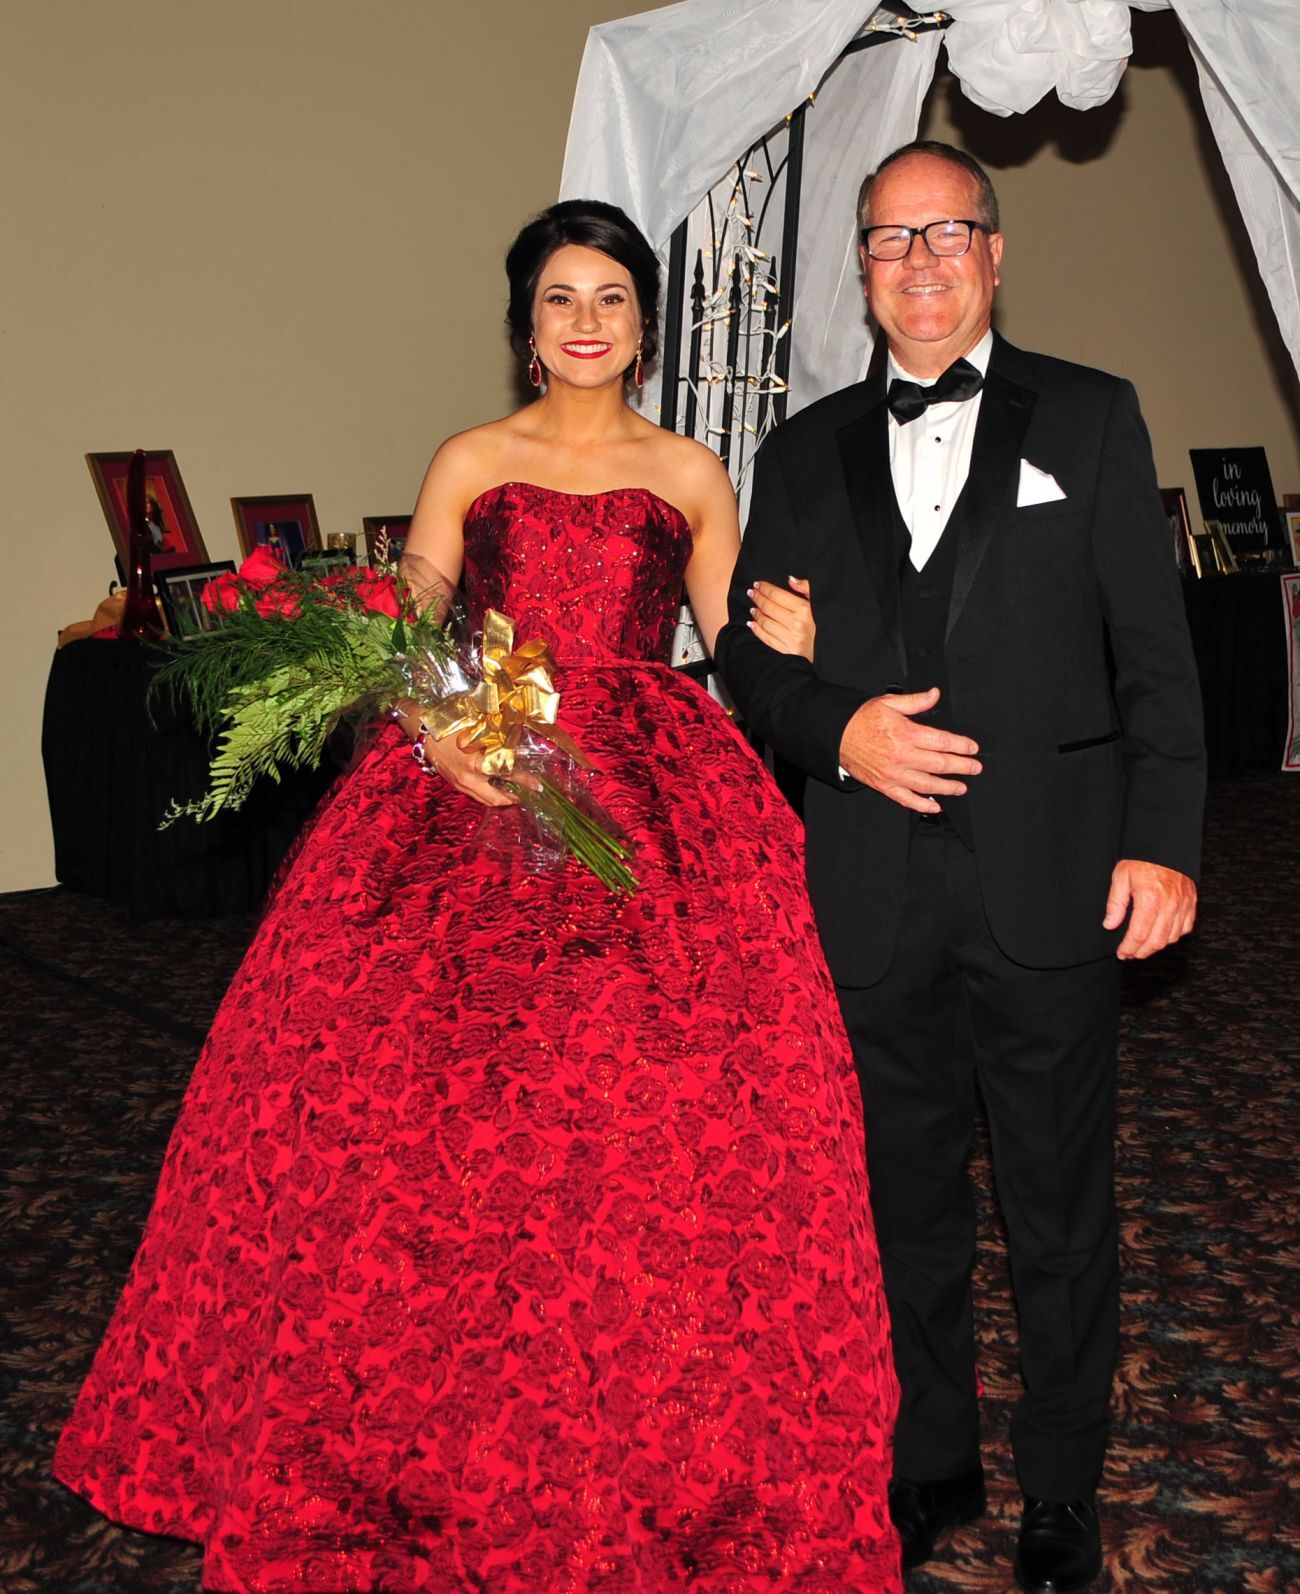 Regina Maria XLIII Marissa Maria Bailey and her father